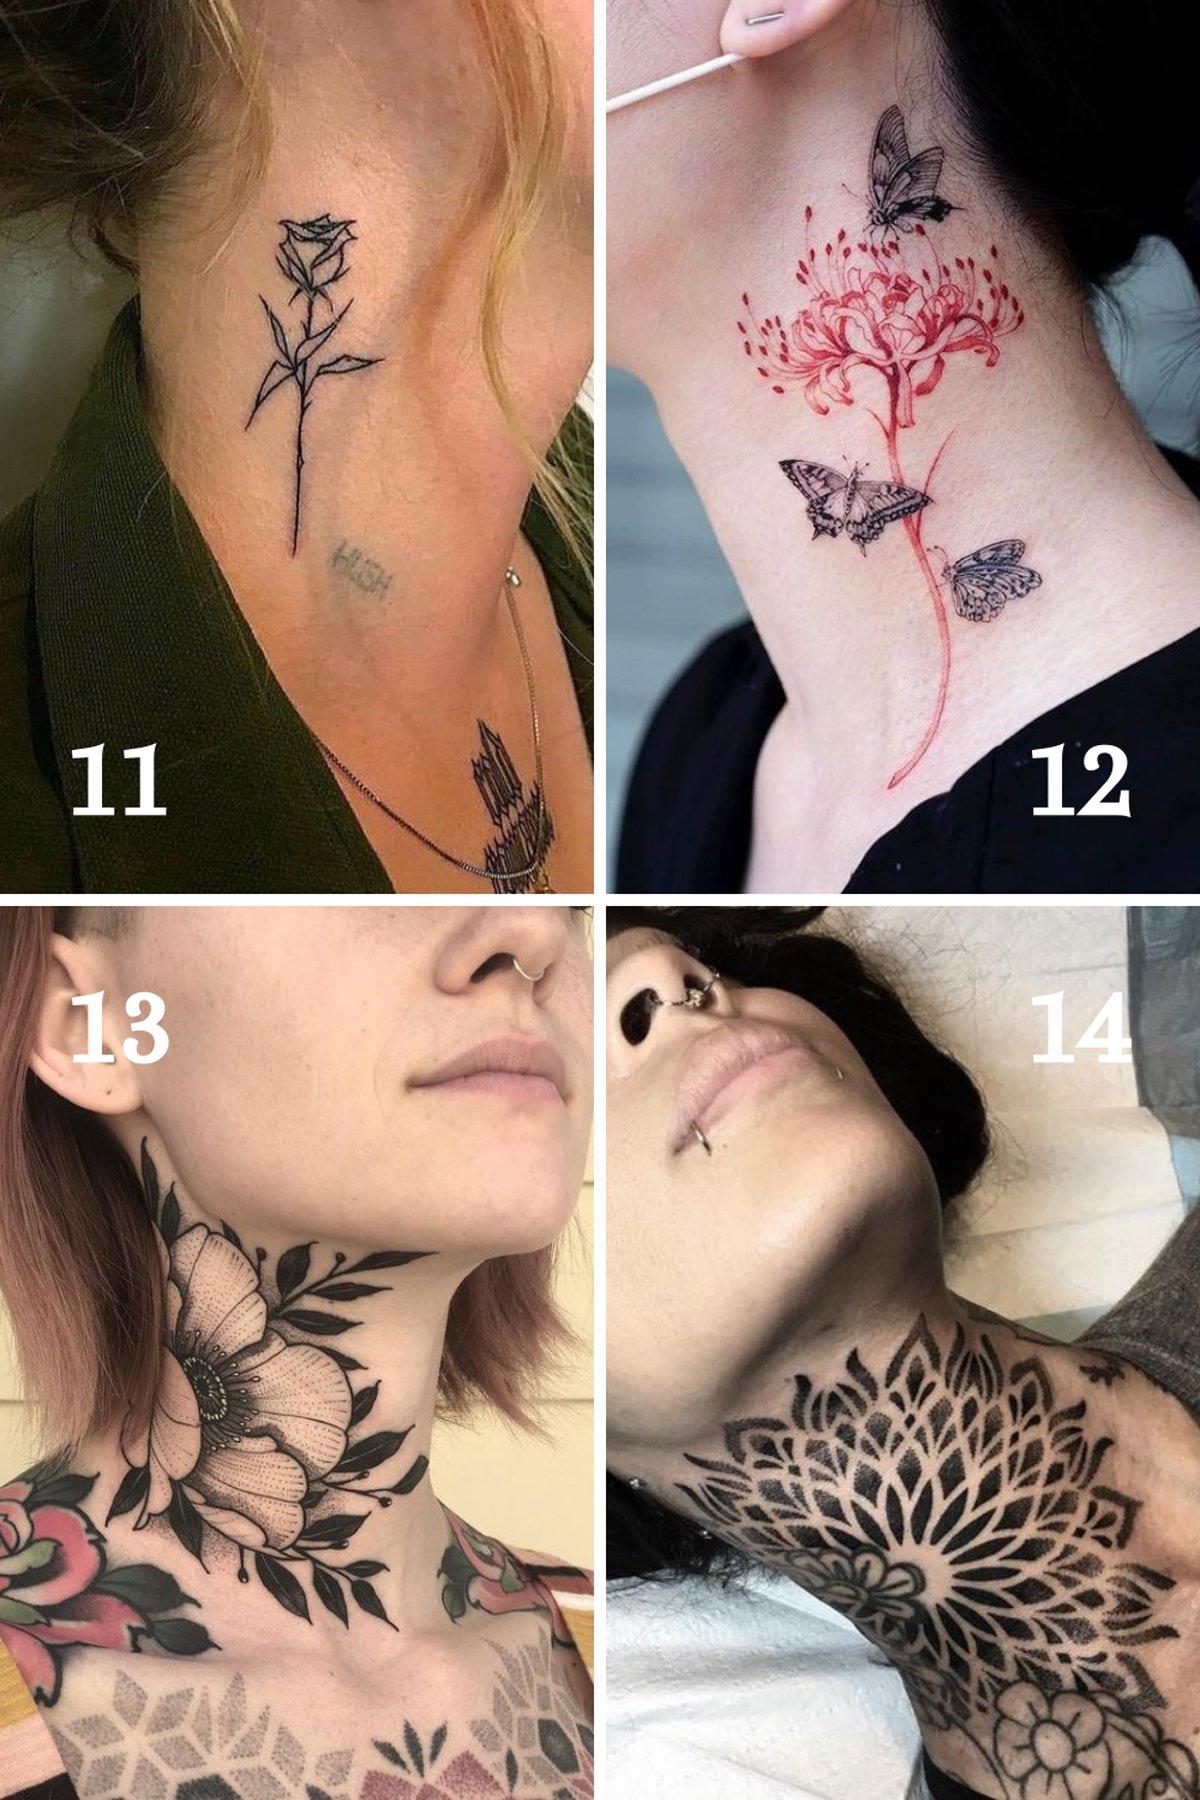 Flower Tattoo Ideas for Women's Necks